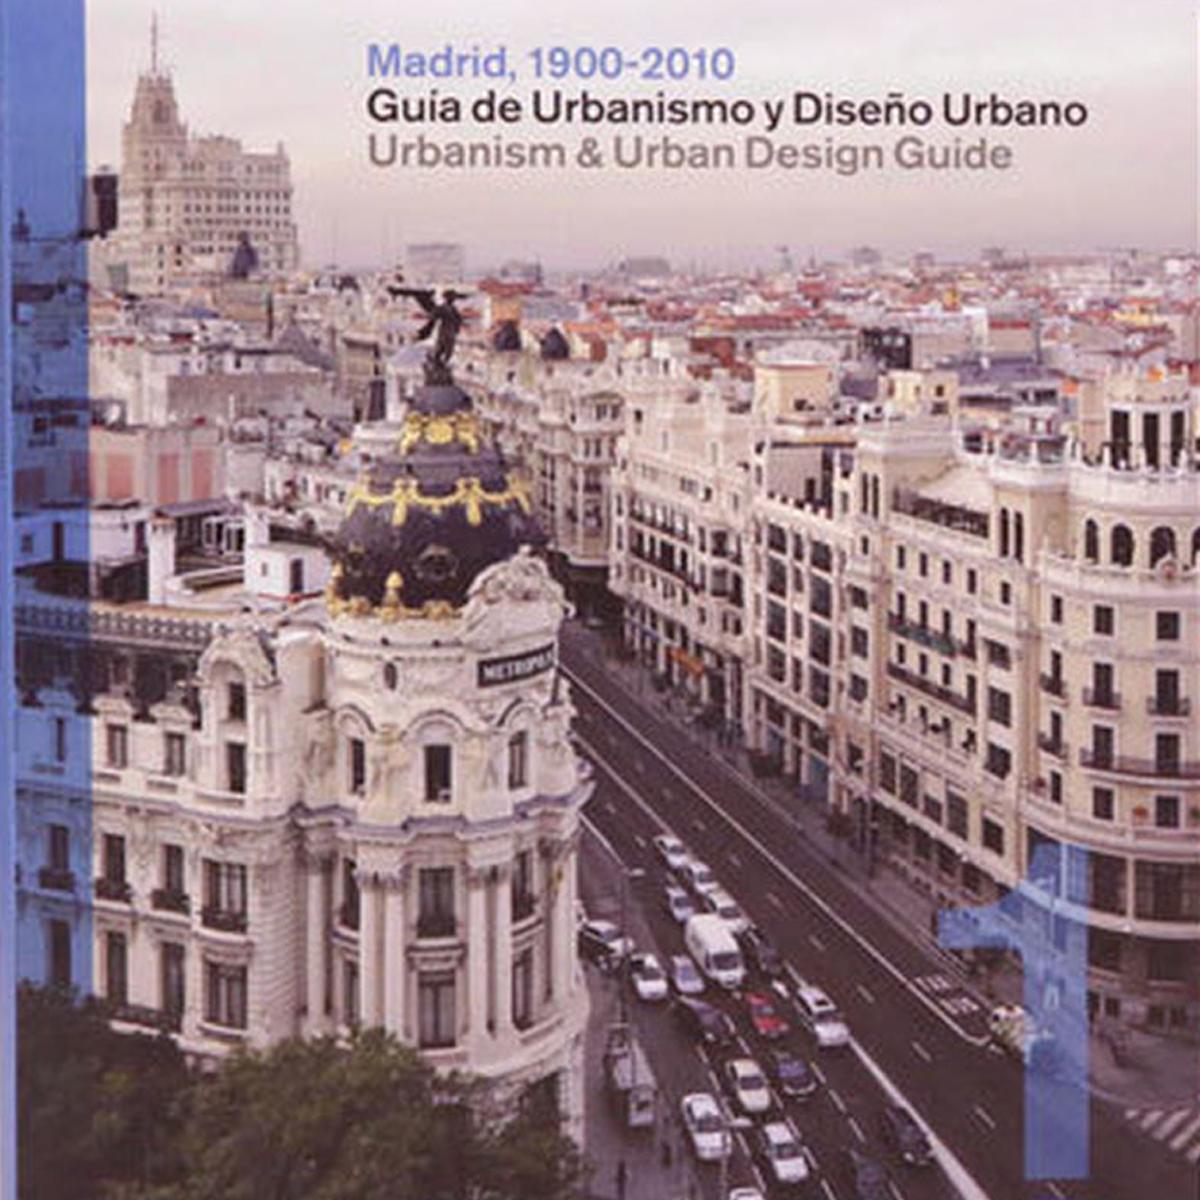 Madrid, 1900-2010. Urbanism and Urban Design Guide